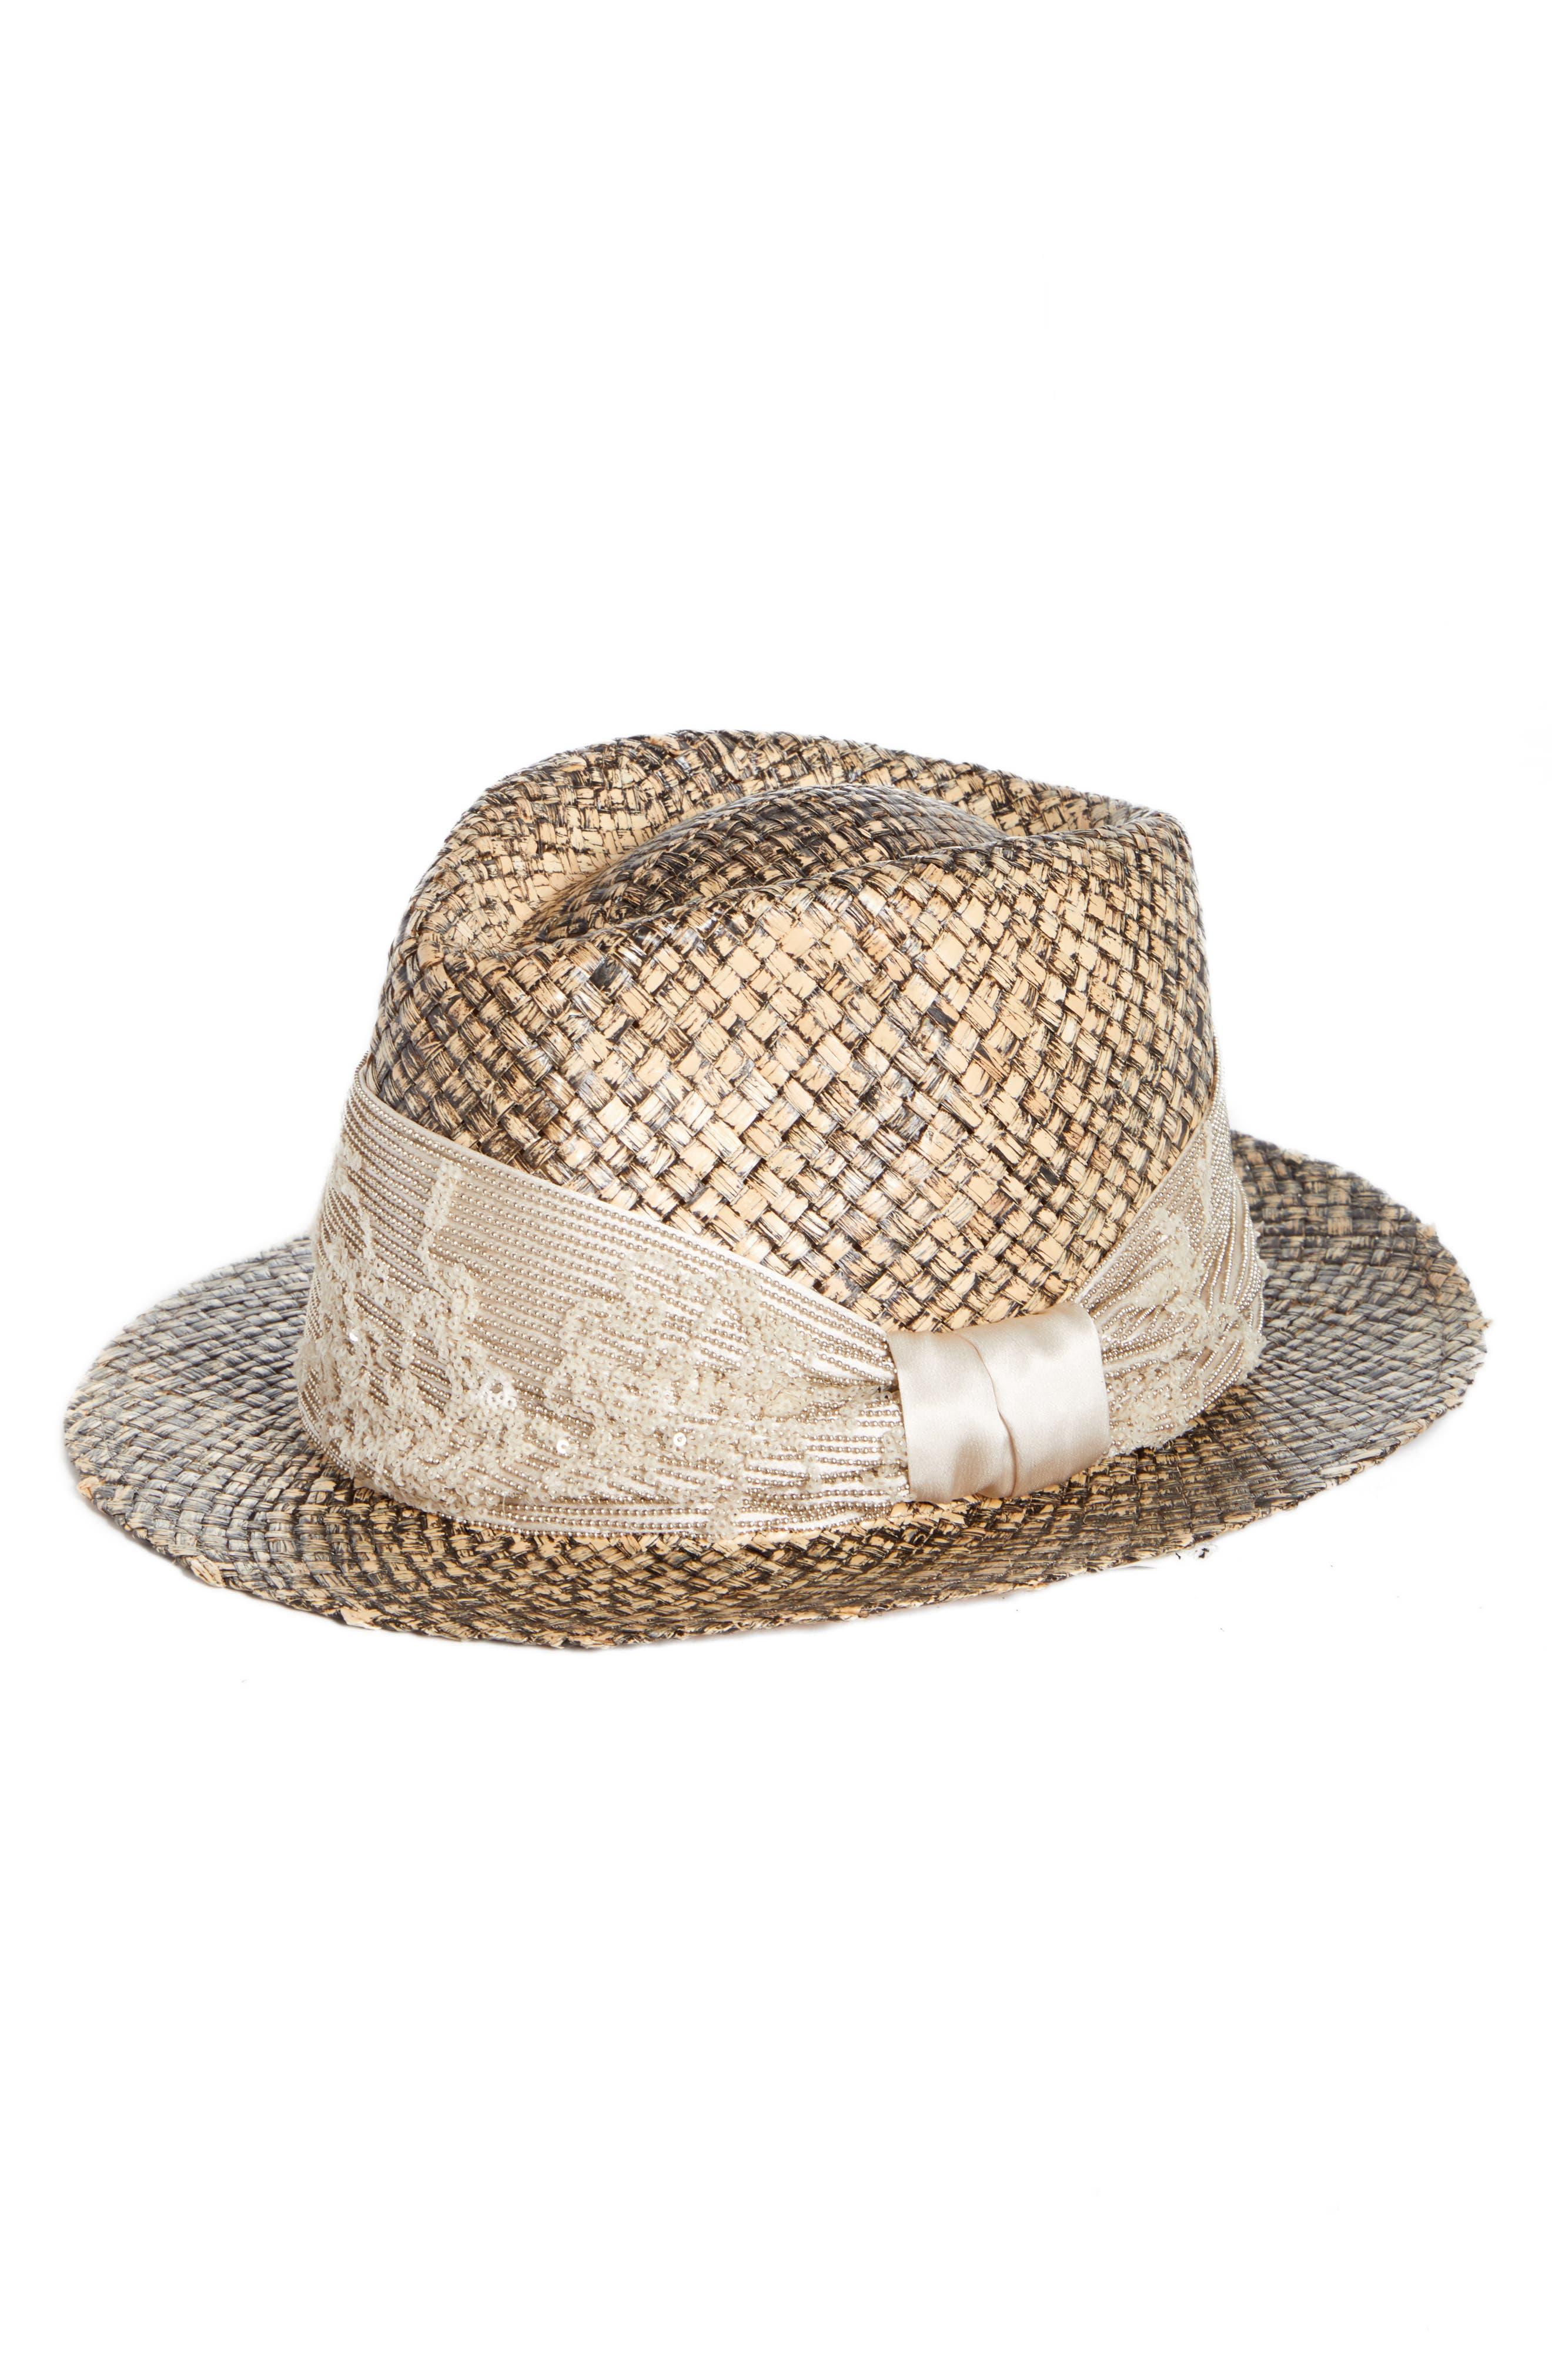 8d155ff9c Buy sun hats hats for women - Best women's sun hats hats shop ...